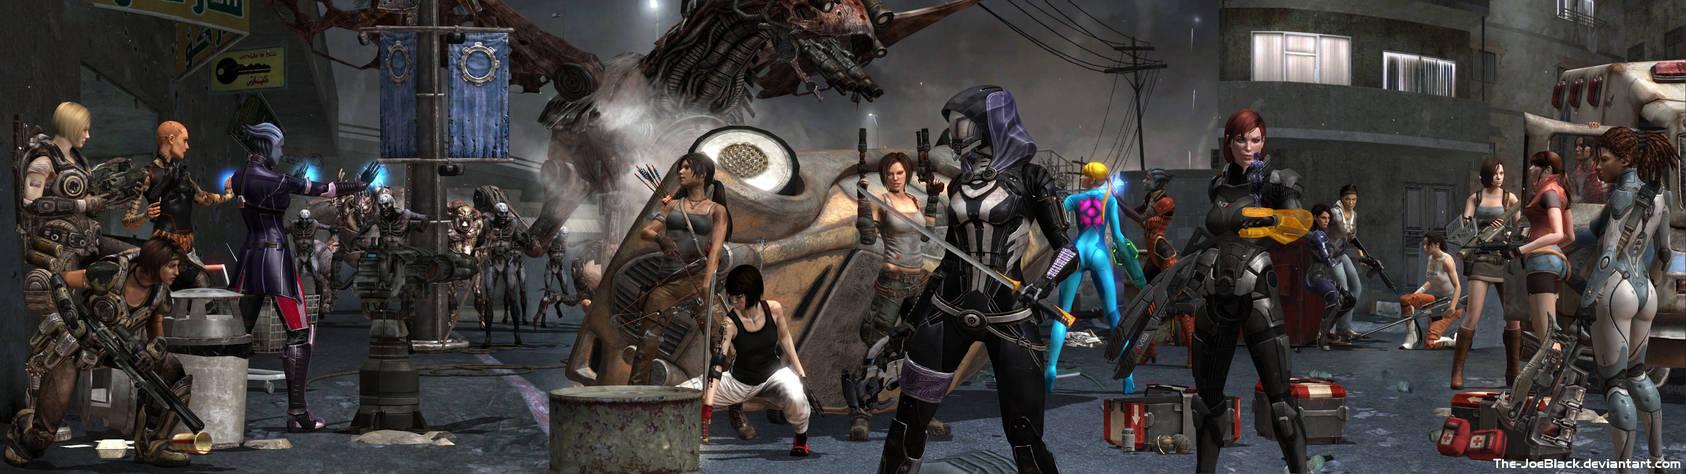 Gamings Toughest Girls Dual Screen Wallpaper By